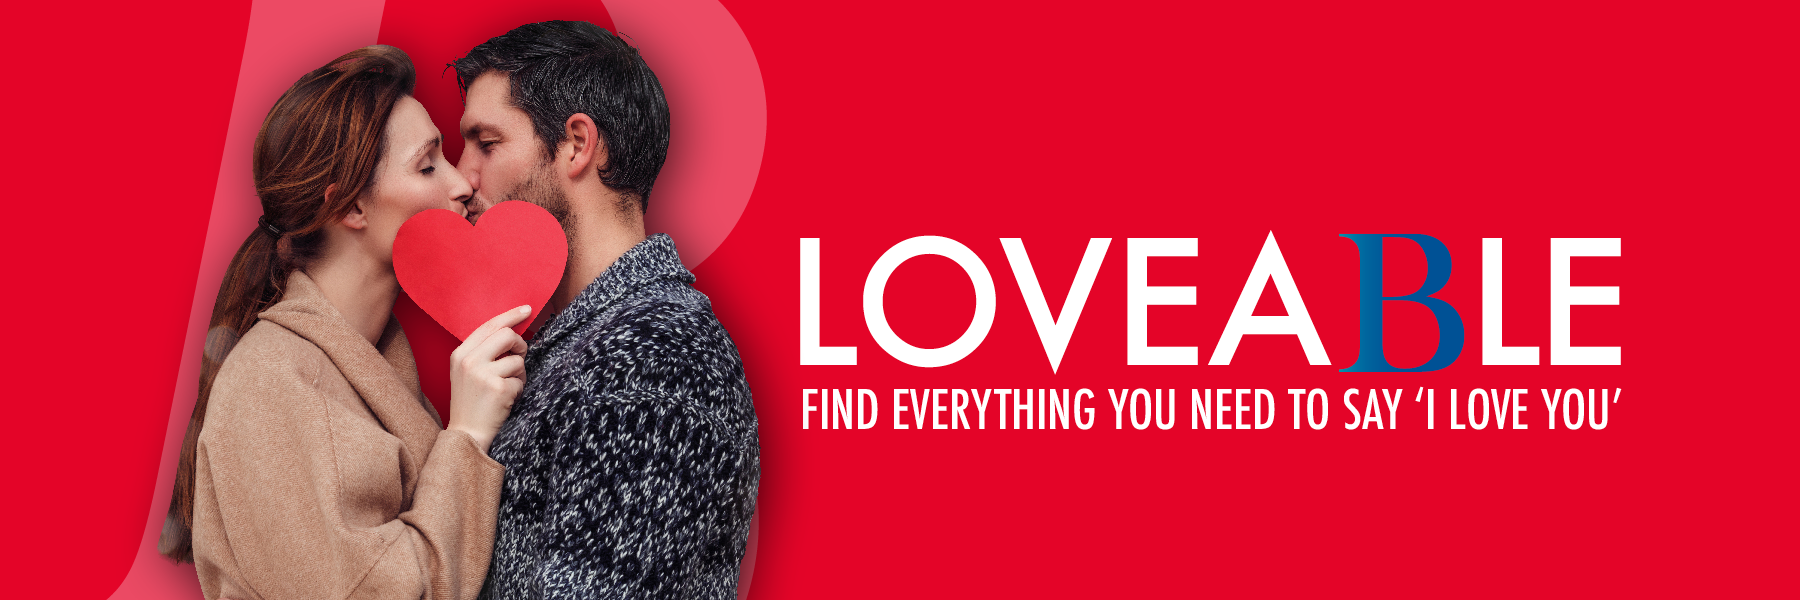 Lovable, Valentine Gift Inspiration